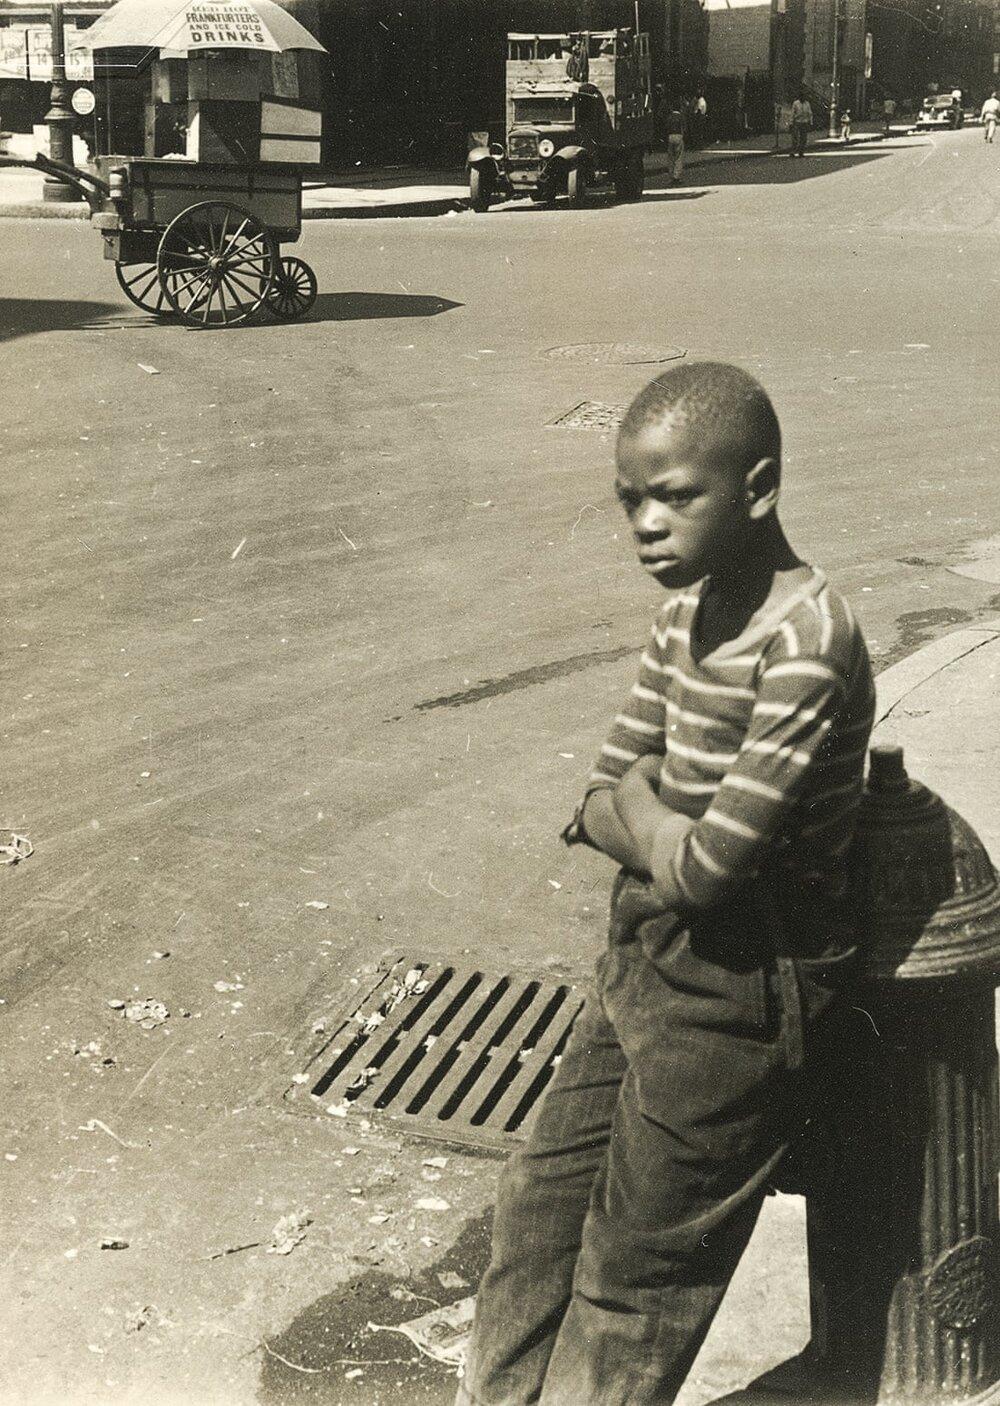 Гелен Левітт, Boy Leaning on a Hydrant, 1940